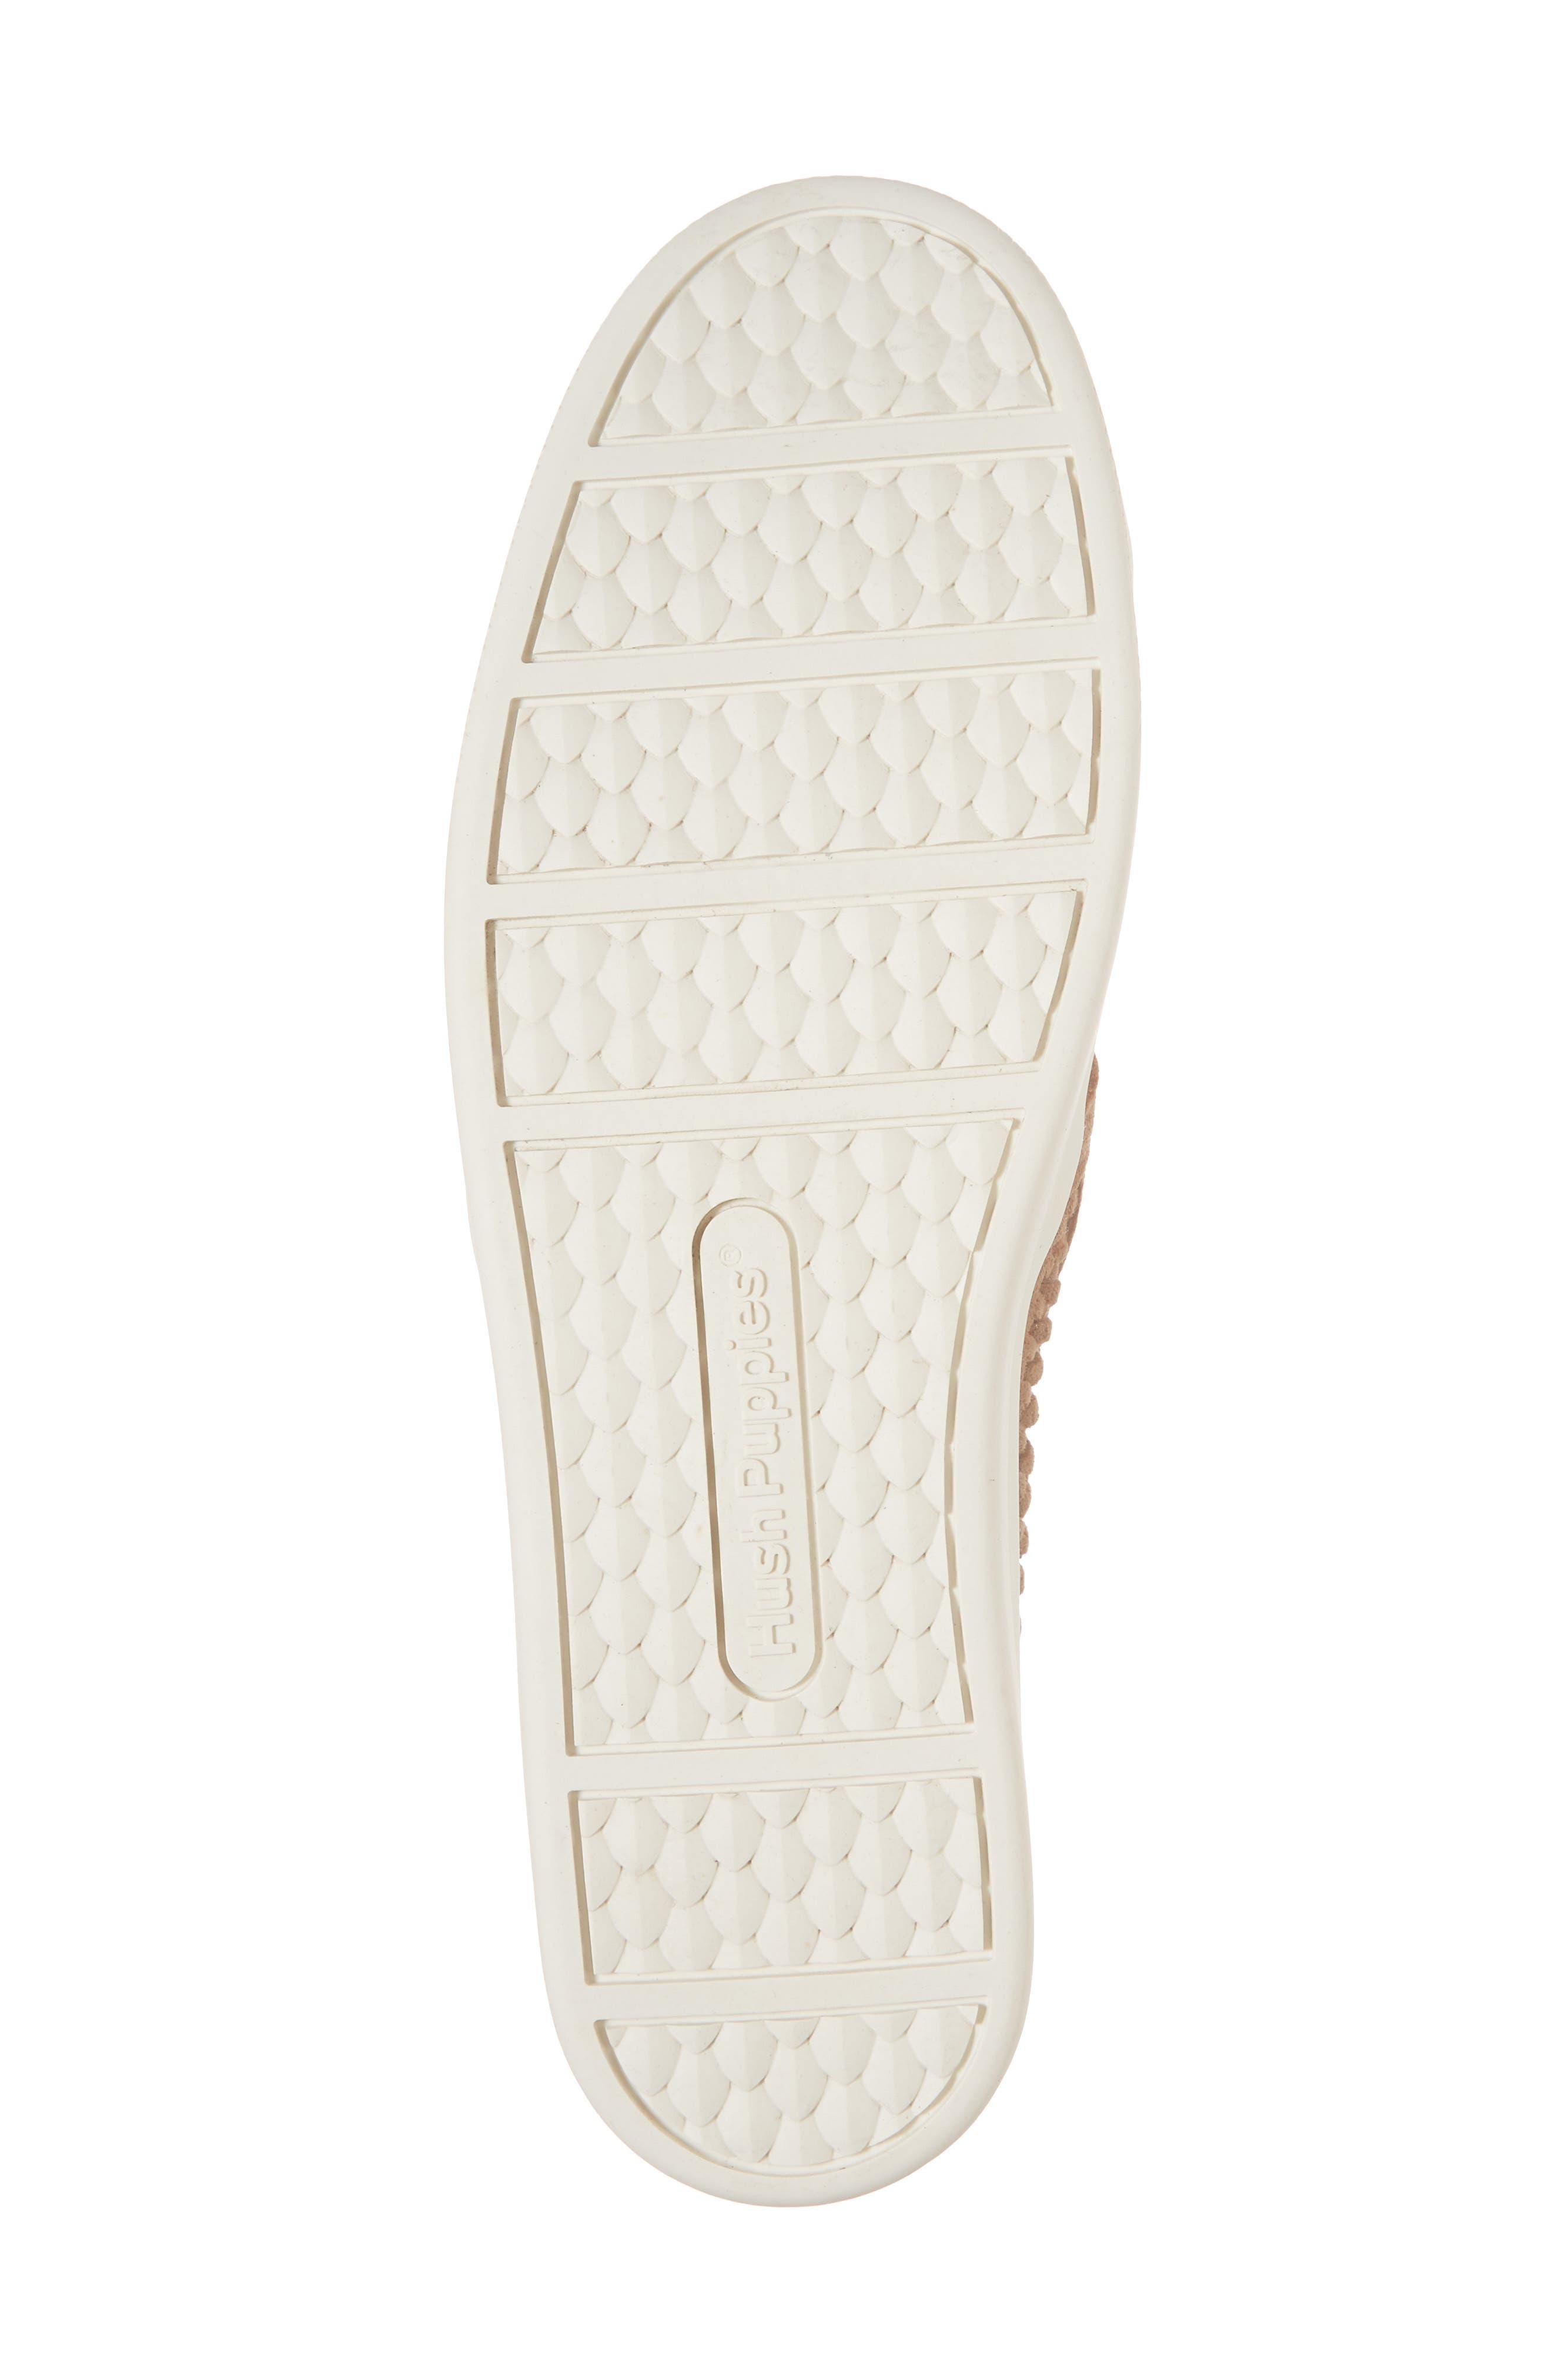 Gabbie Slip-On Sneaker,                             Alternate thumbnail 6, color,                             Tan Suede